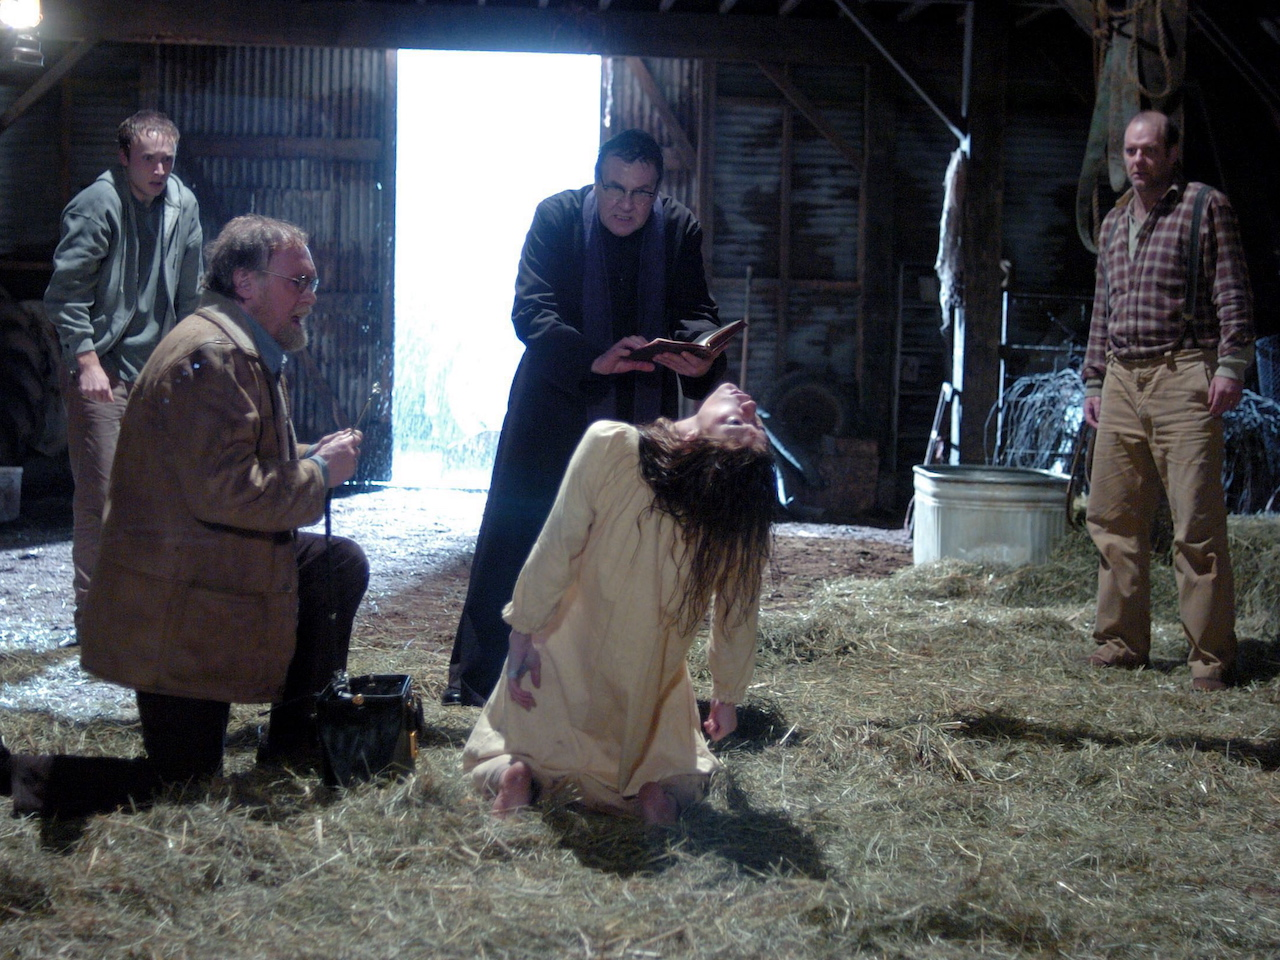 Netflix Horror 2018-The Exorcism of Emily Rose scene in a barn